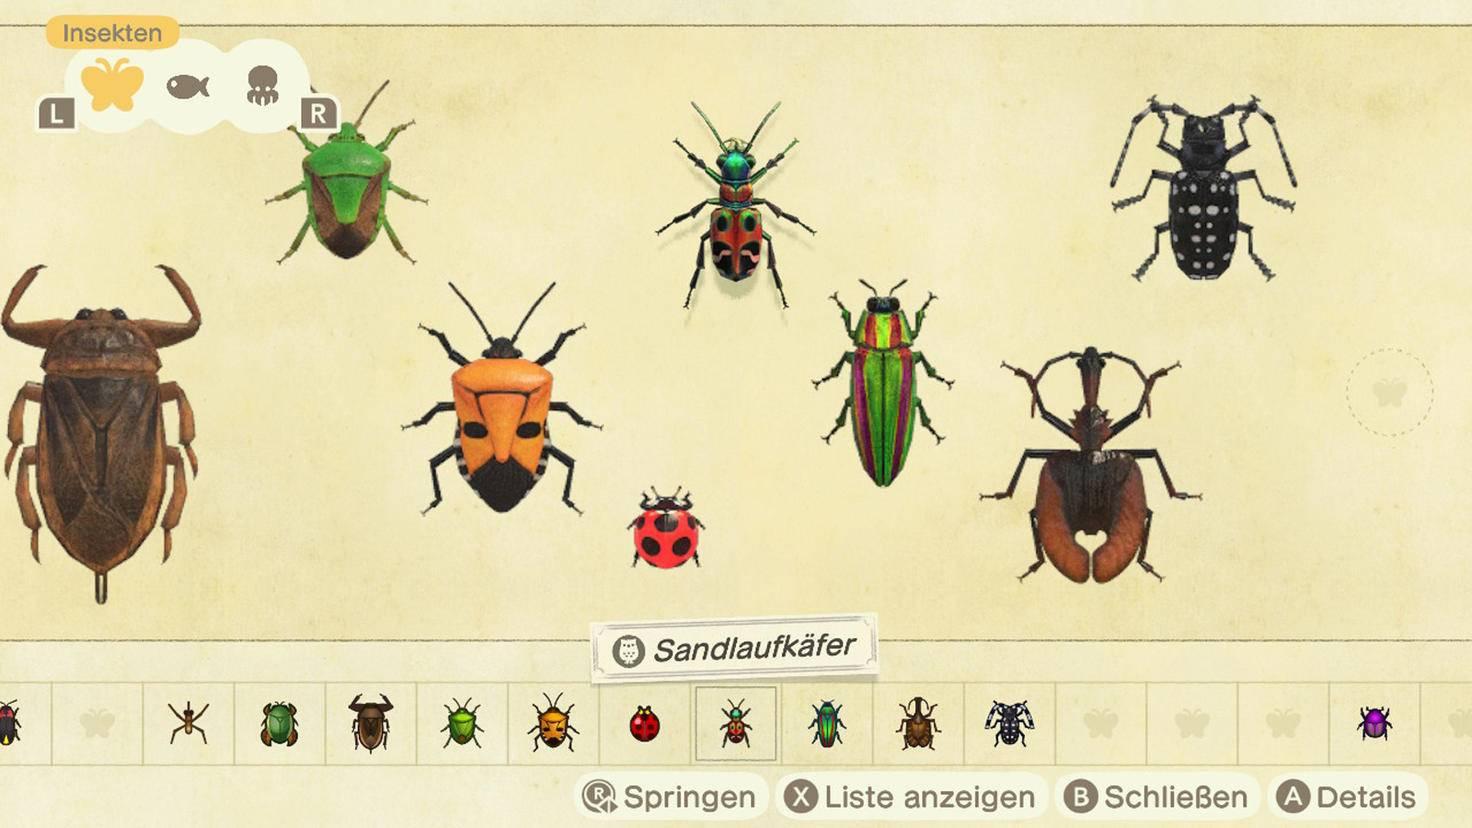 Animal Crossing New Horizons Faunapädie 5